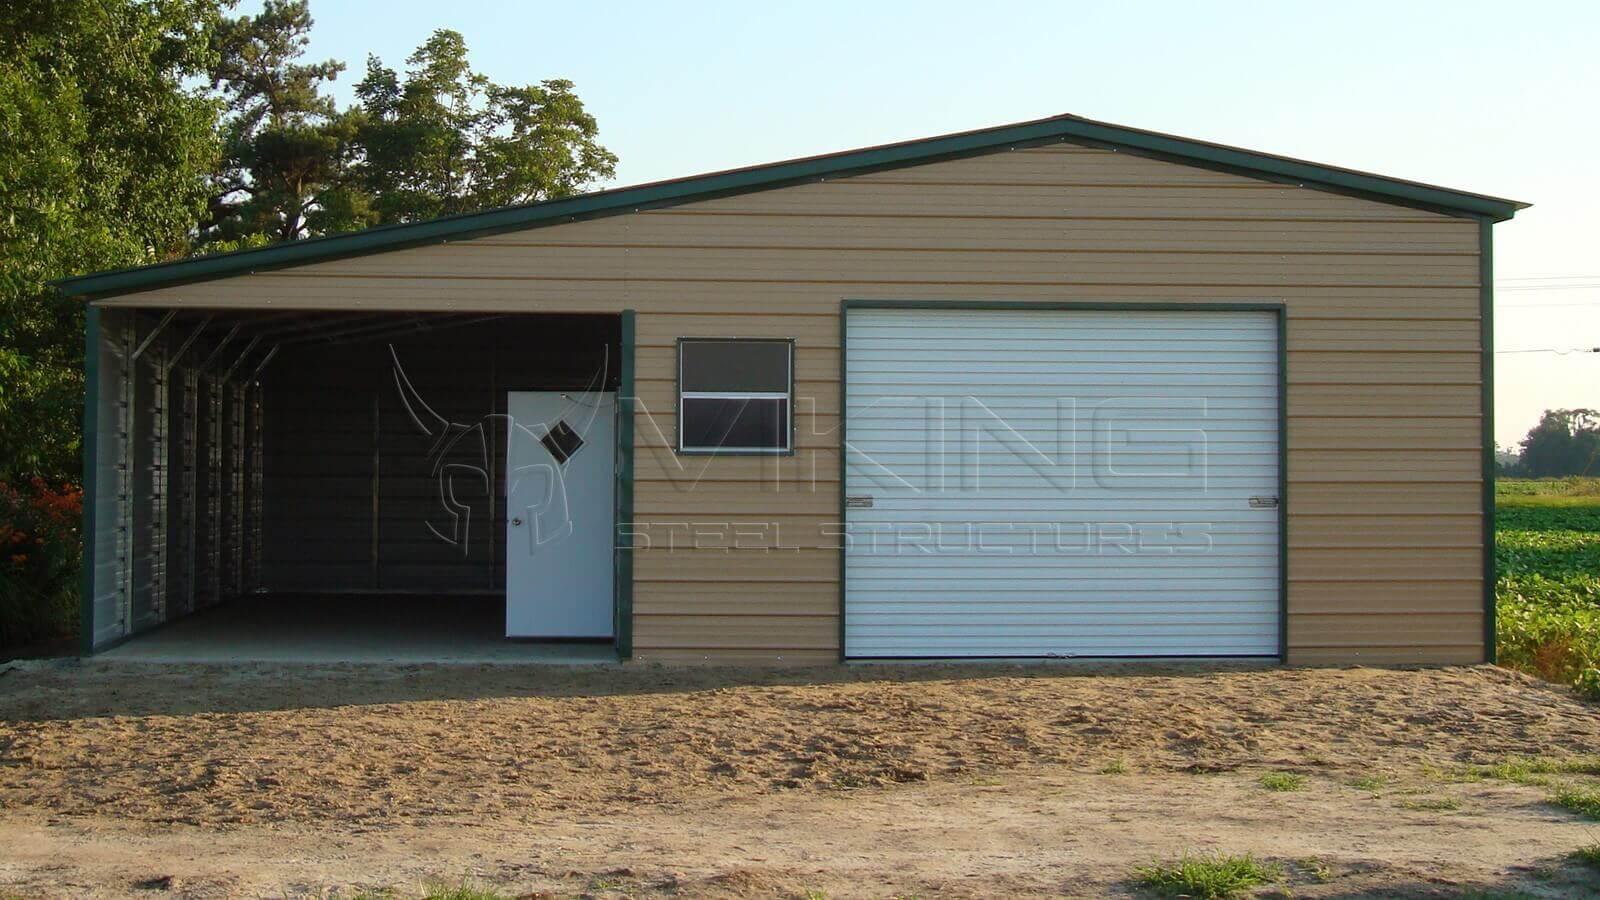 Fully Enclosed Carports : Viking steel structures metal carports barns garages